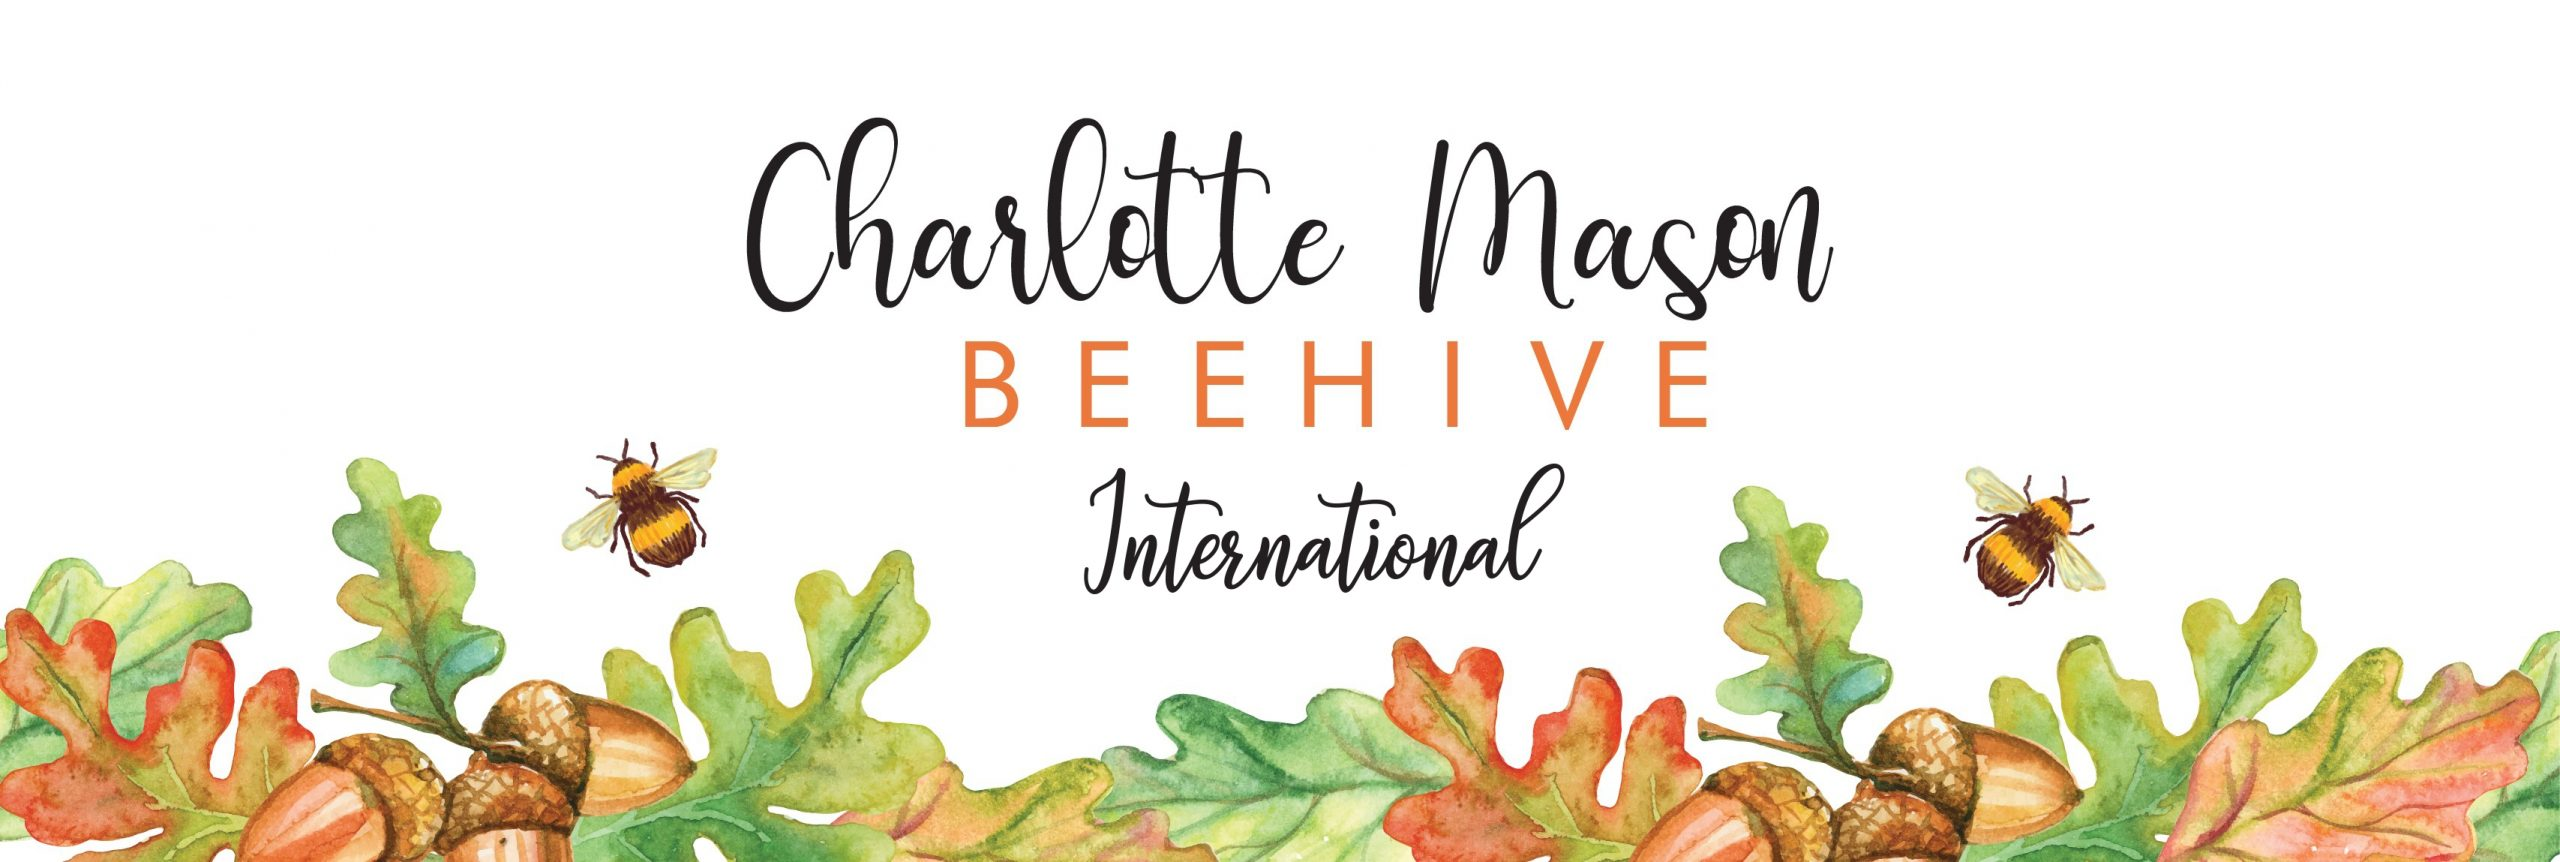 Charlotte Mason Beehive International